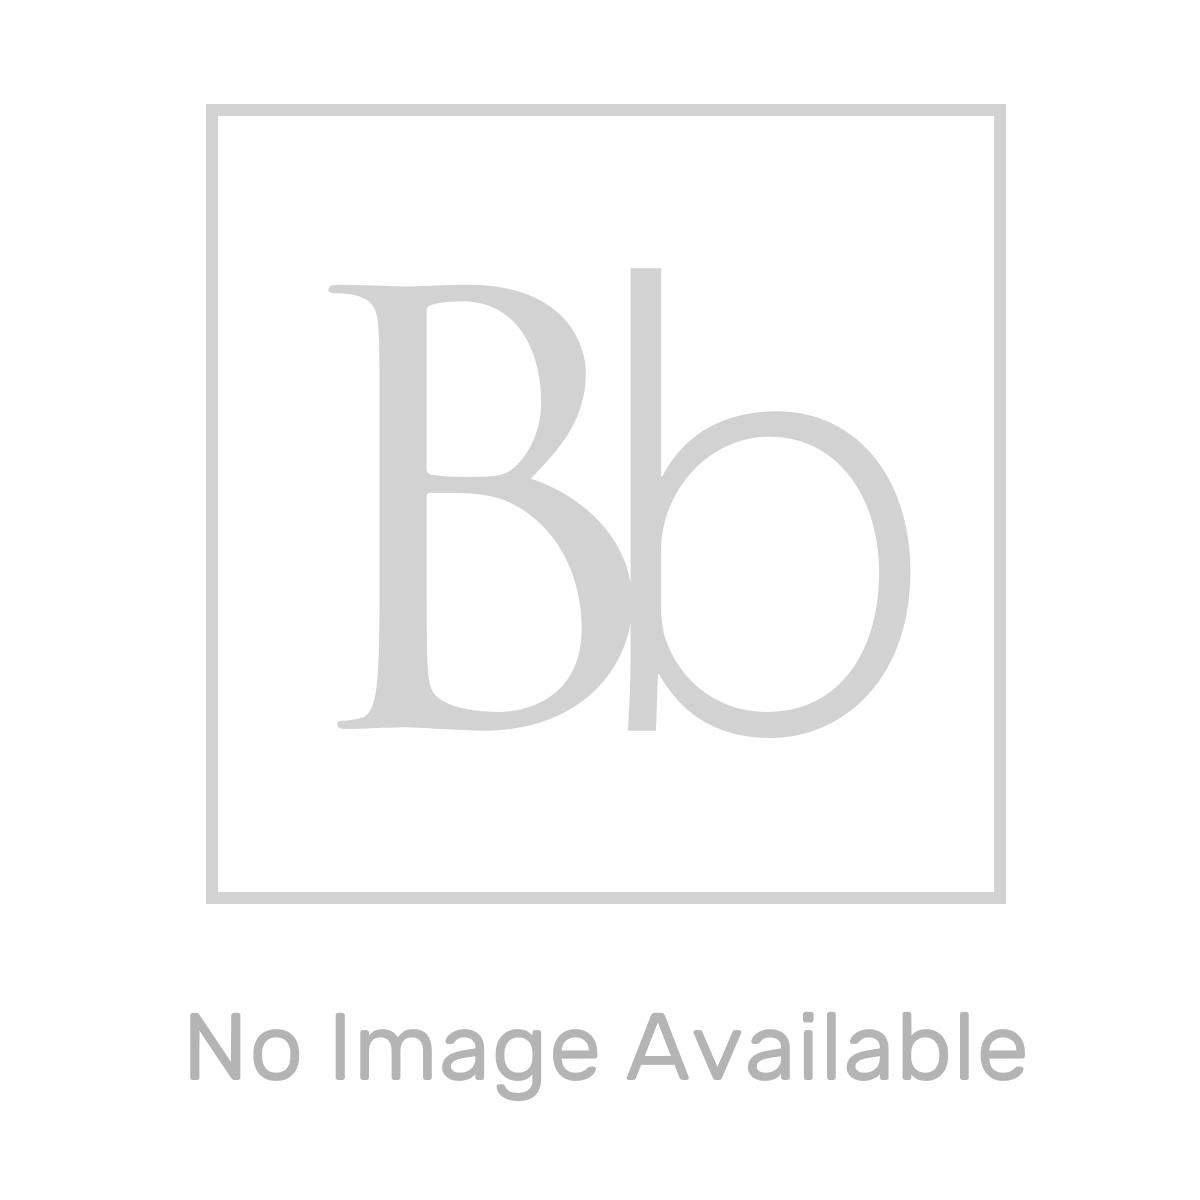 RAK Exposed Automatic Urinal Cistern 4.5L Measurements